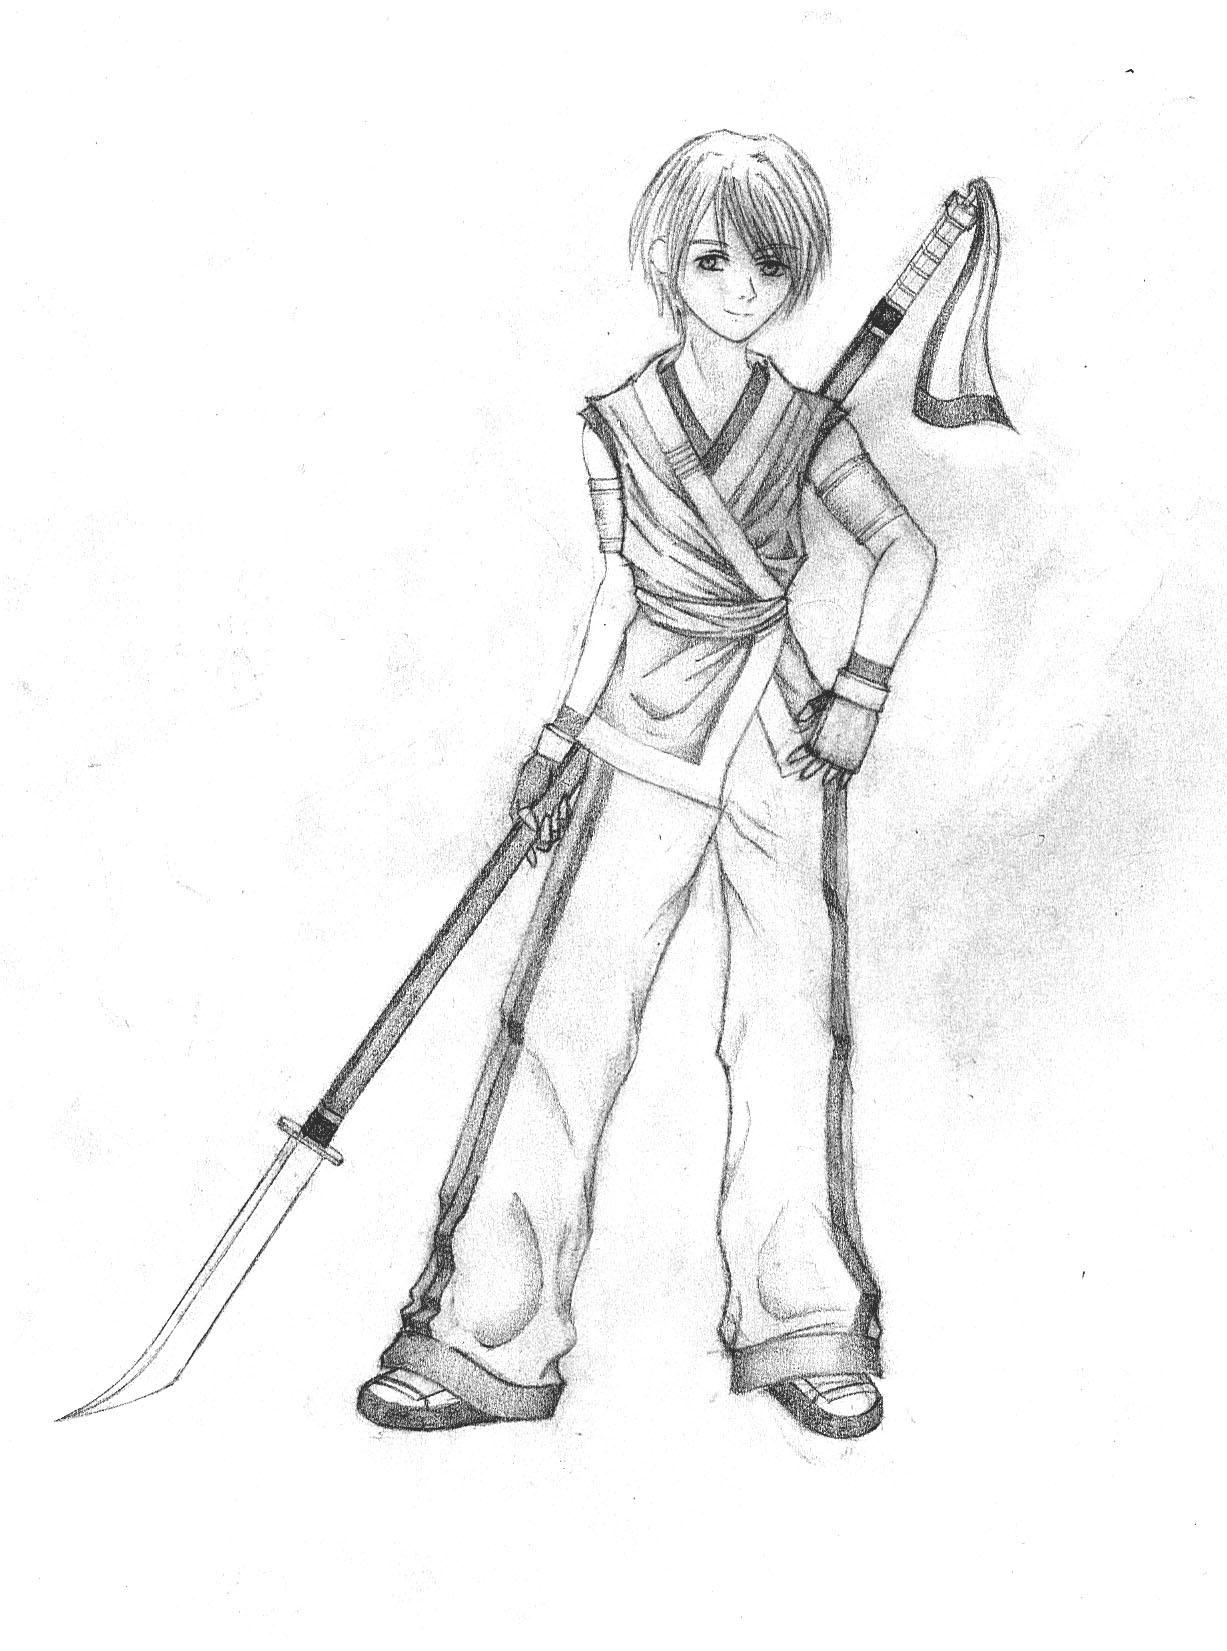 Boy with Naginata by Taciturnity456